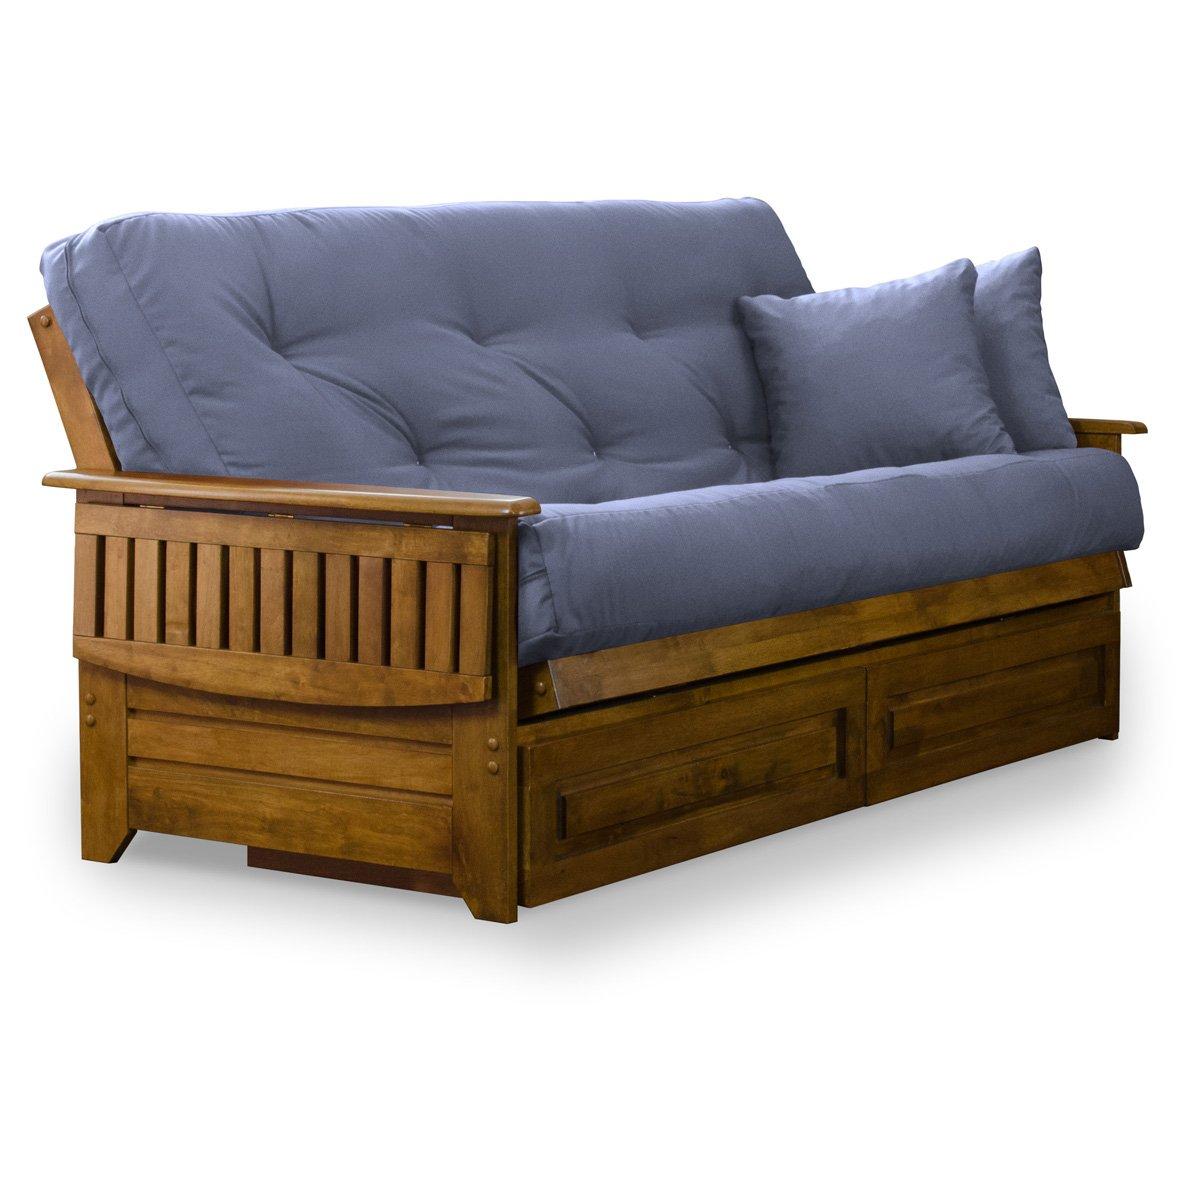 brentwood tray arm full size wood futon frame